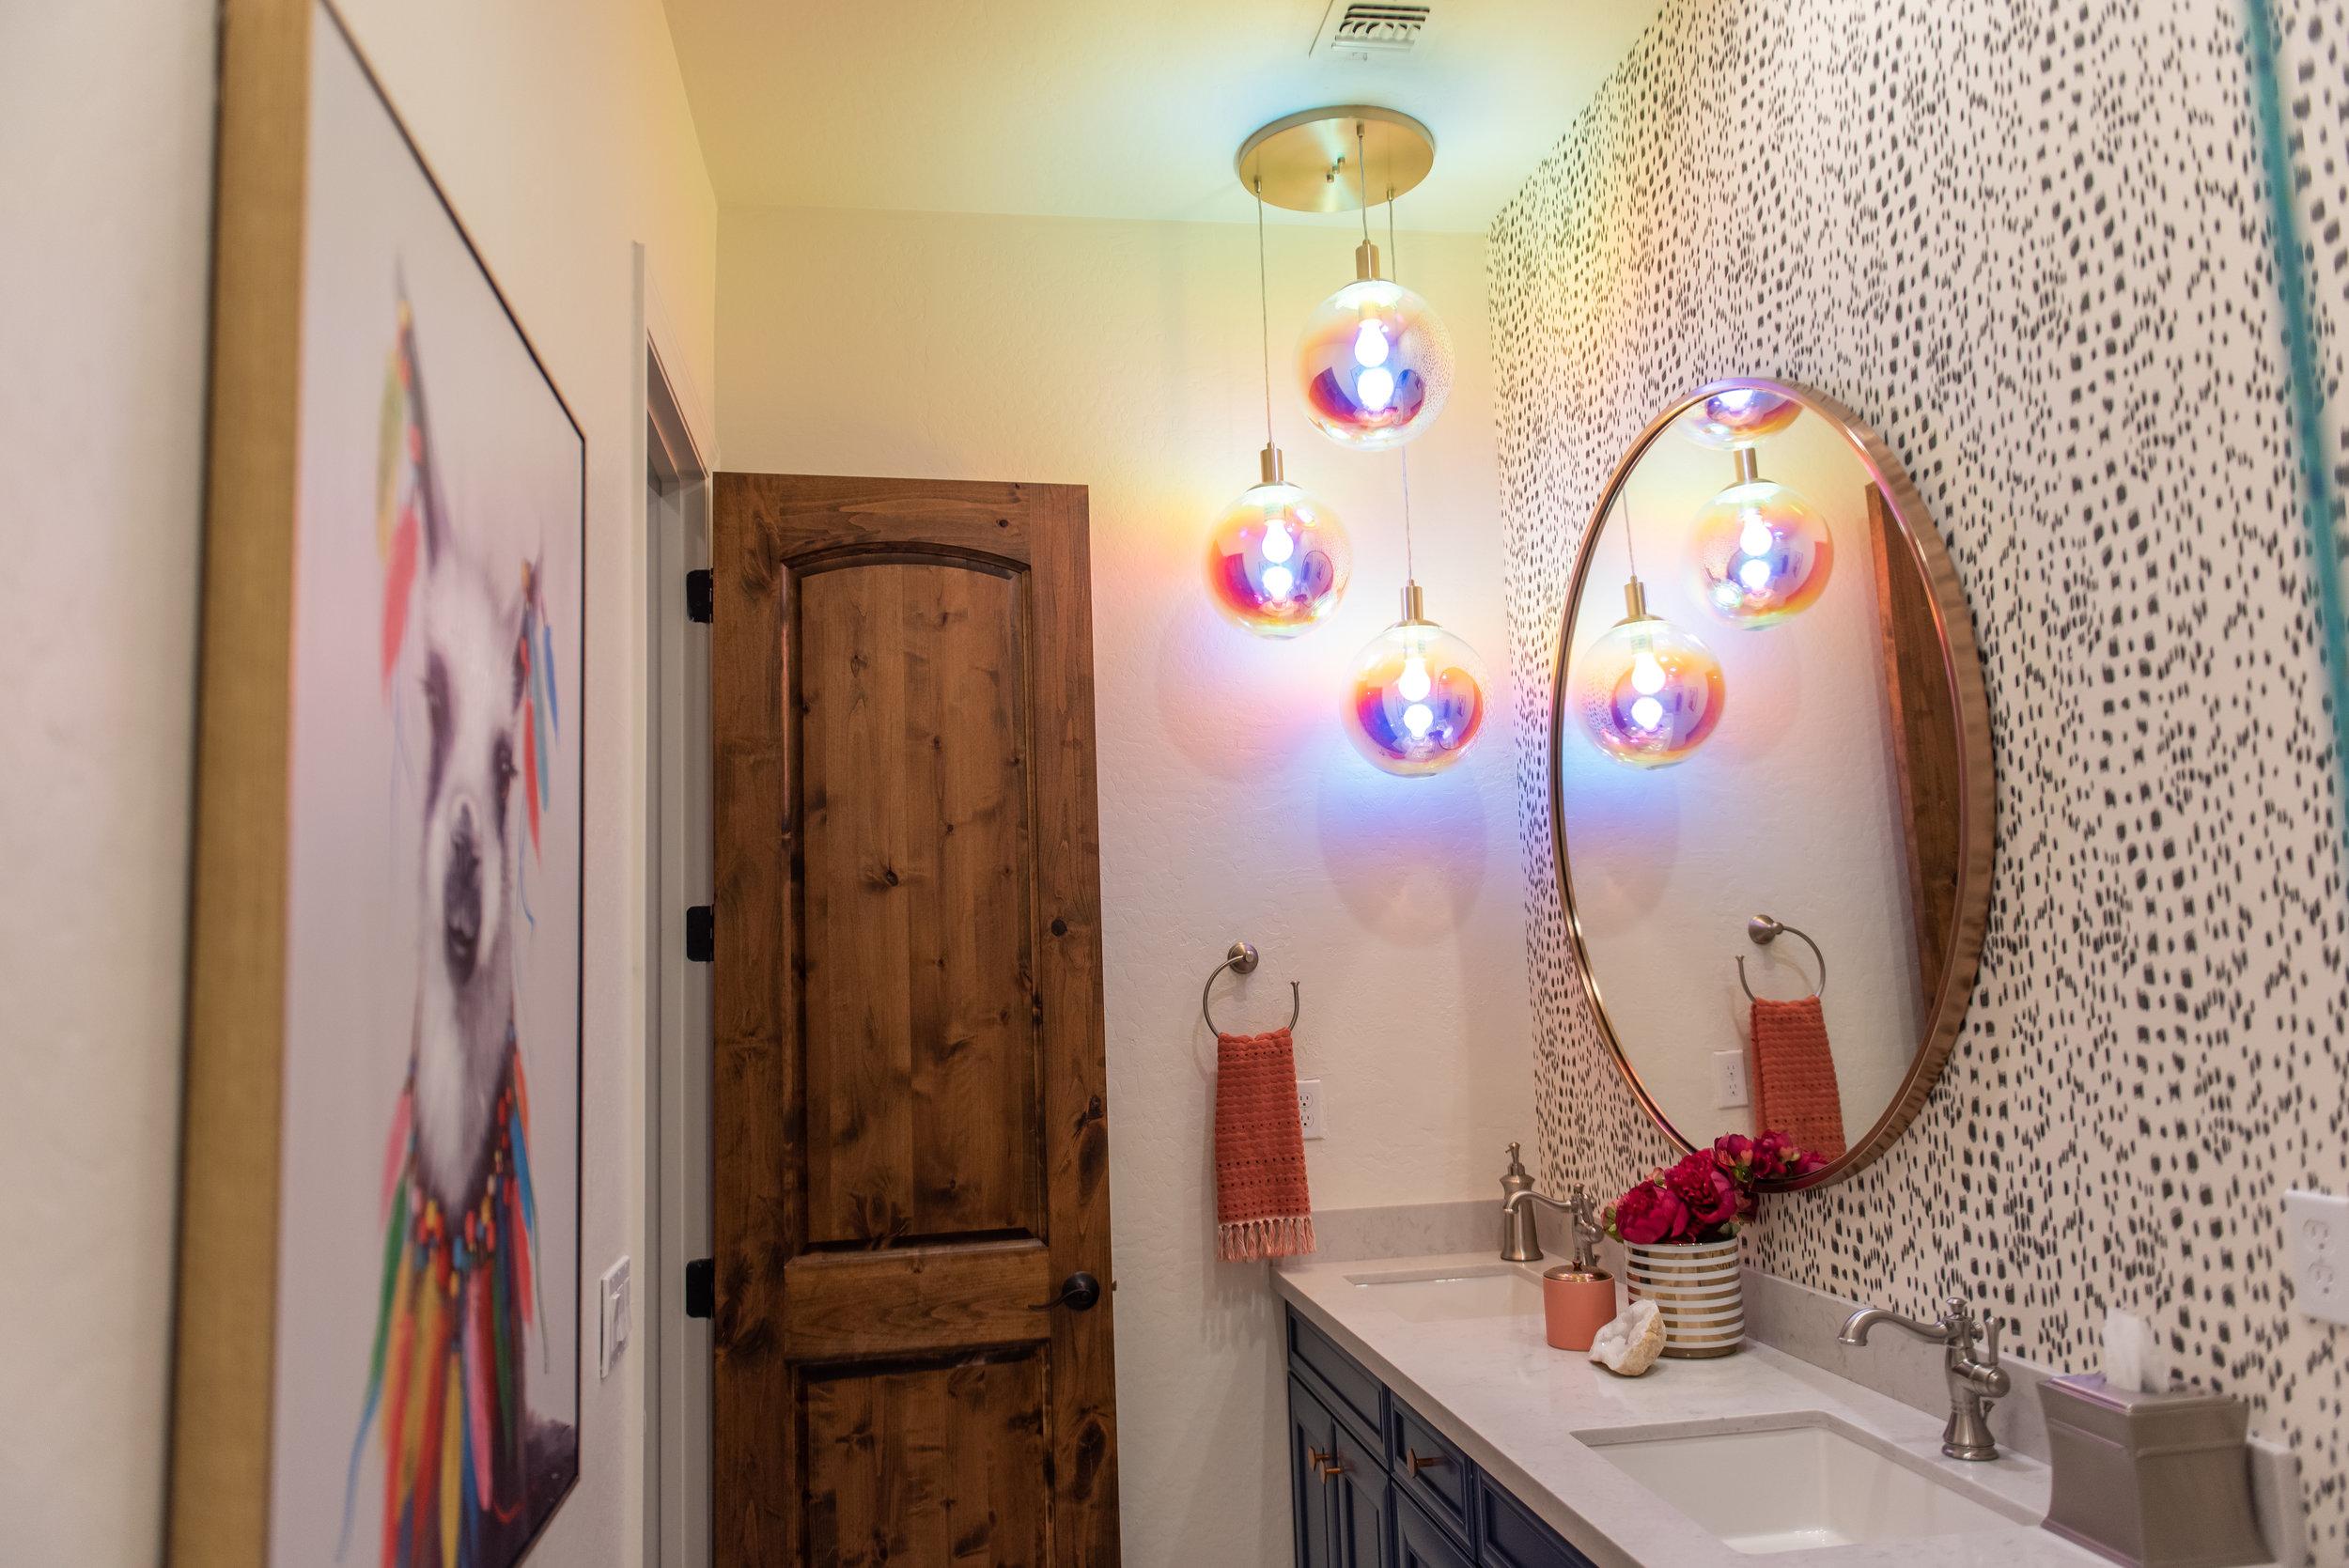 girls+bathroom++round++mirror++wallpaper++lighting++artwork.jpg